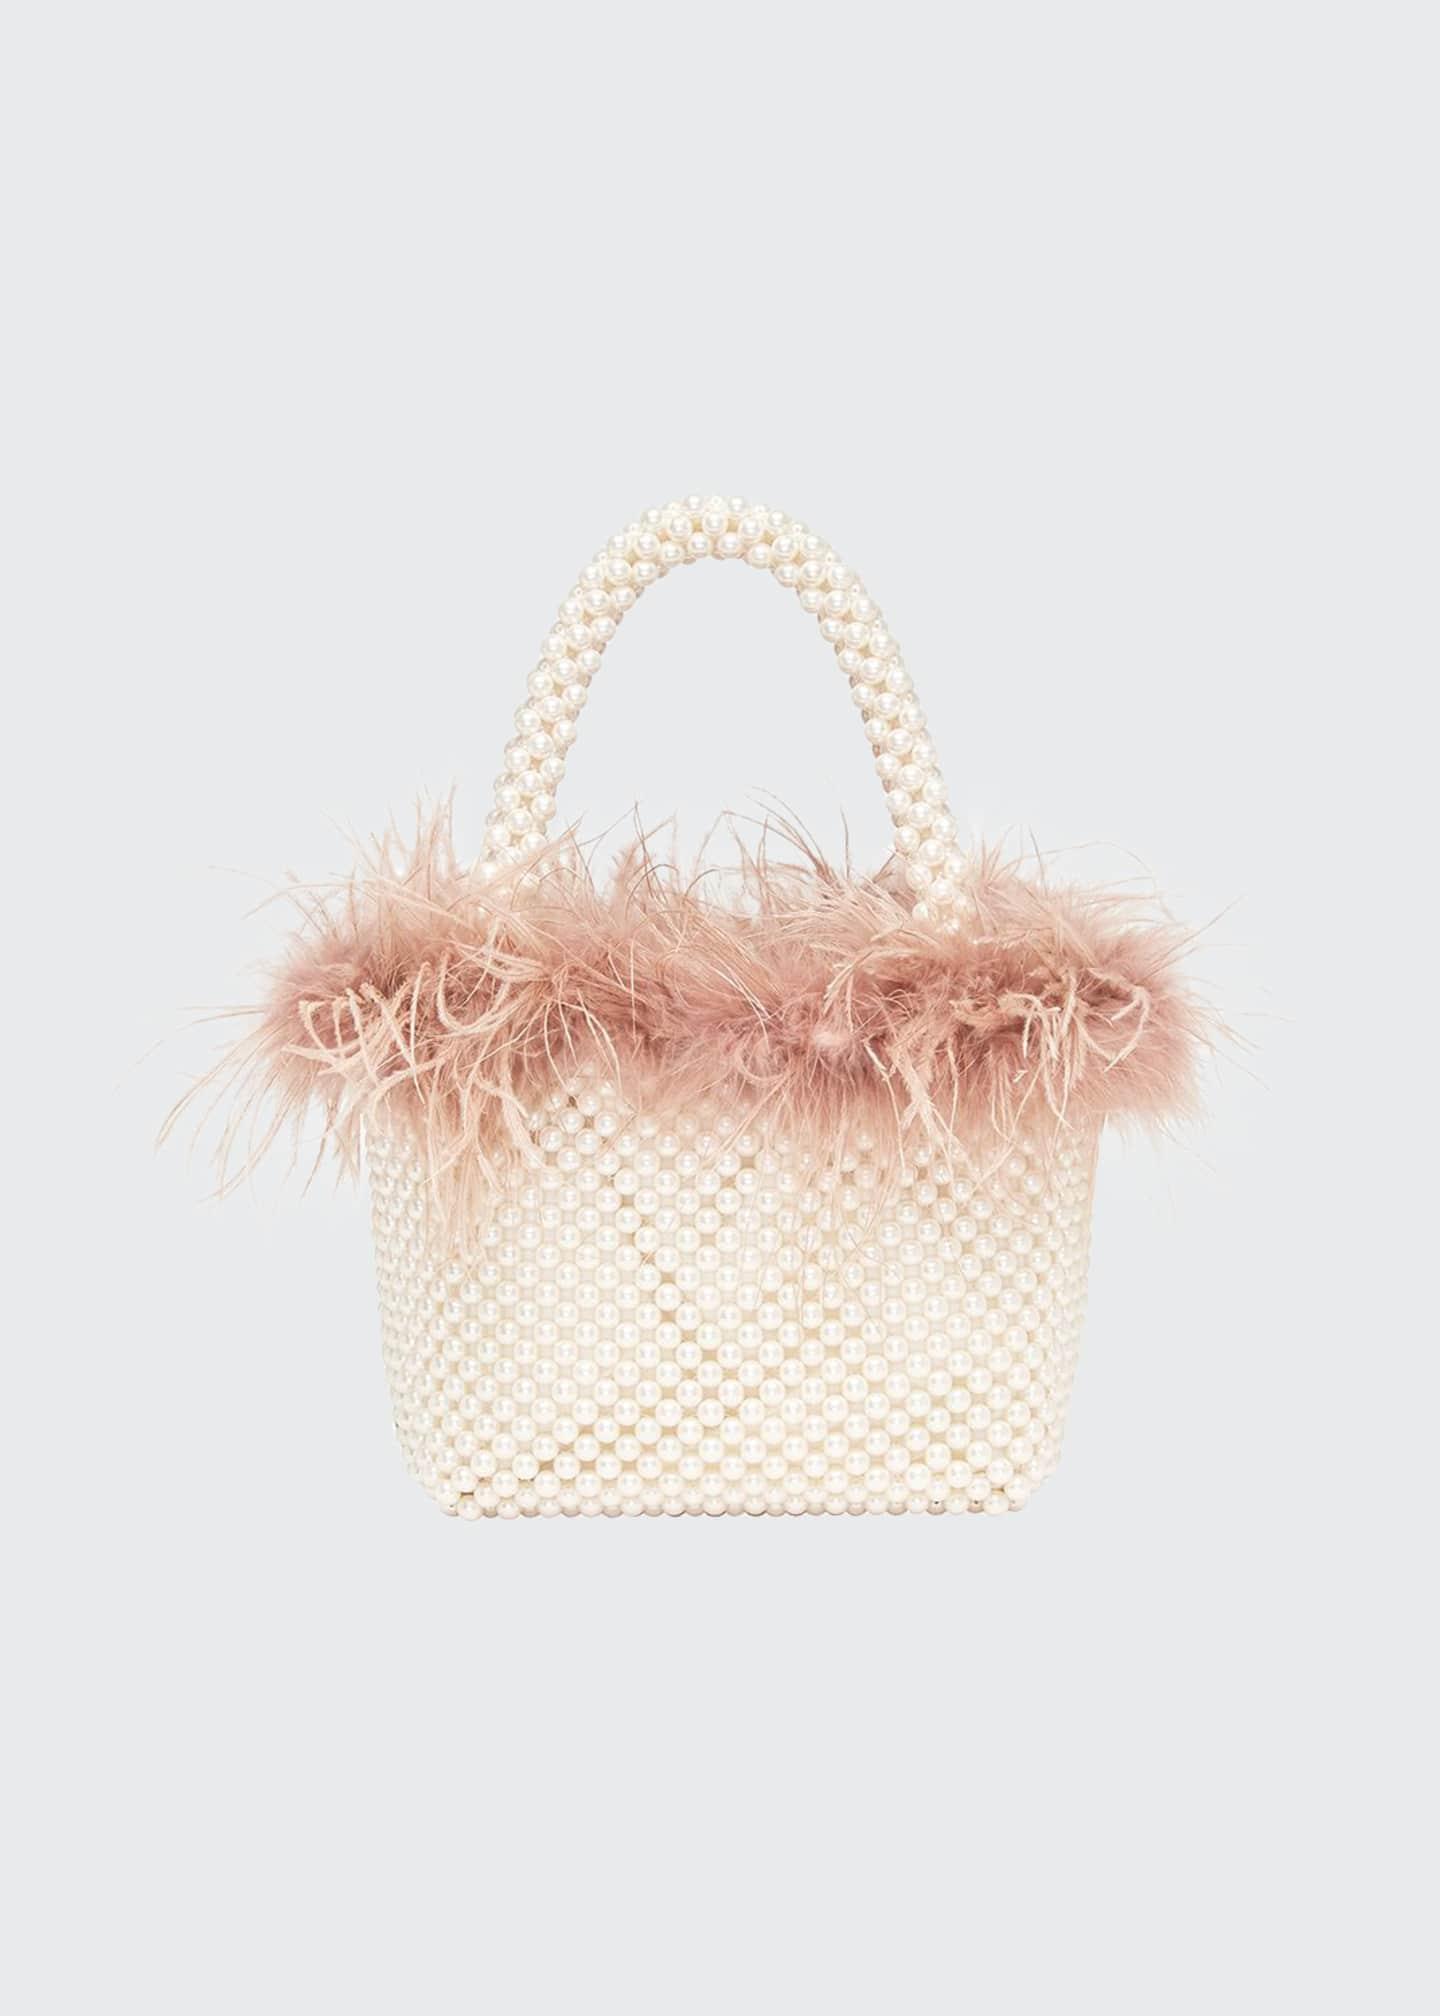 Loeffler Randall Mina Mini Beaded Tote Bag with